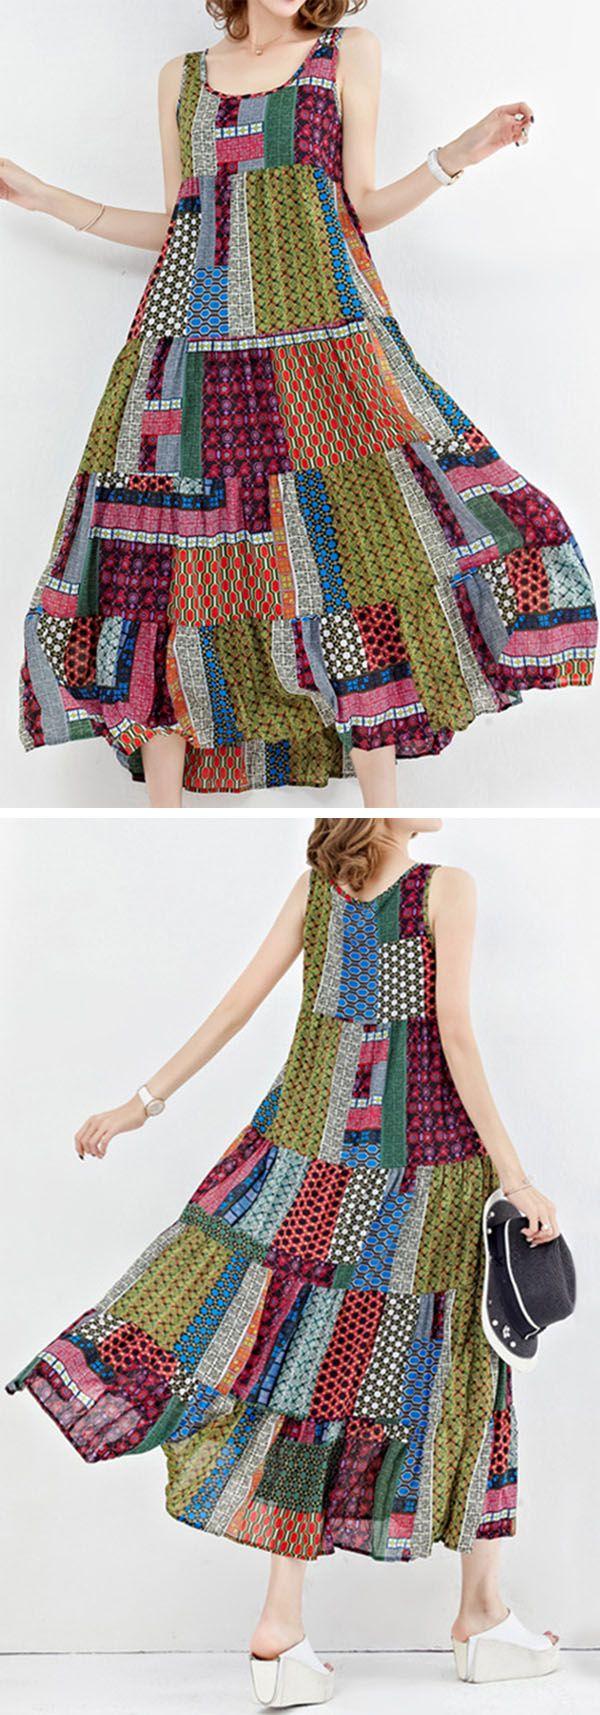 US$25.20 Gracila Bohemian Patchwork Sleeveless O-Neck Long Maxi Dresses Gracila Print Patchwork Short Sleeve O Neck Women Dresses